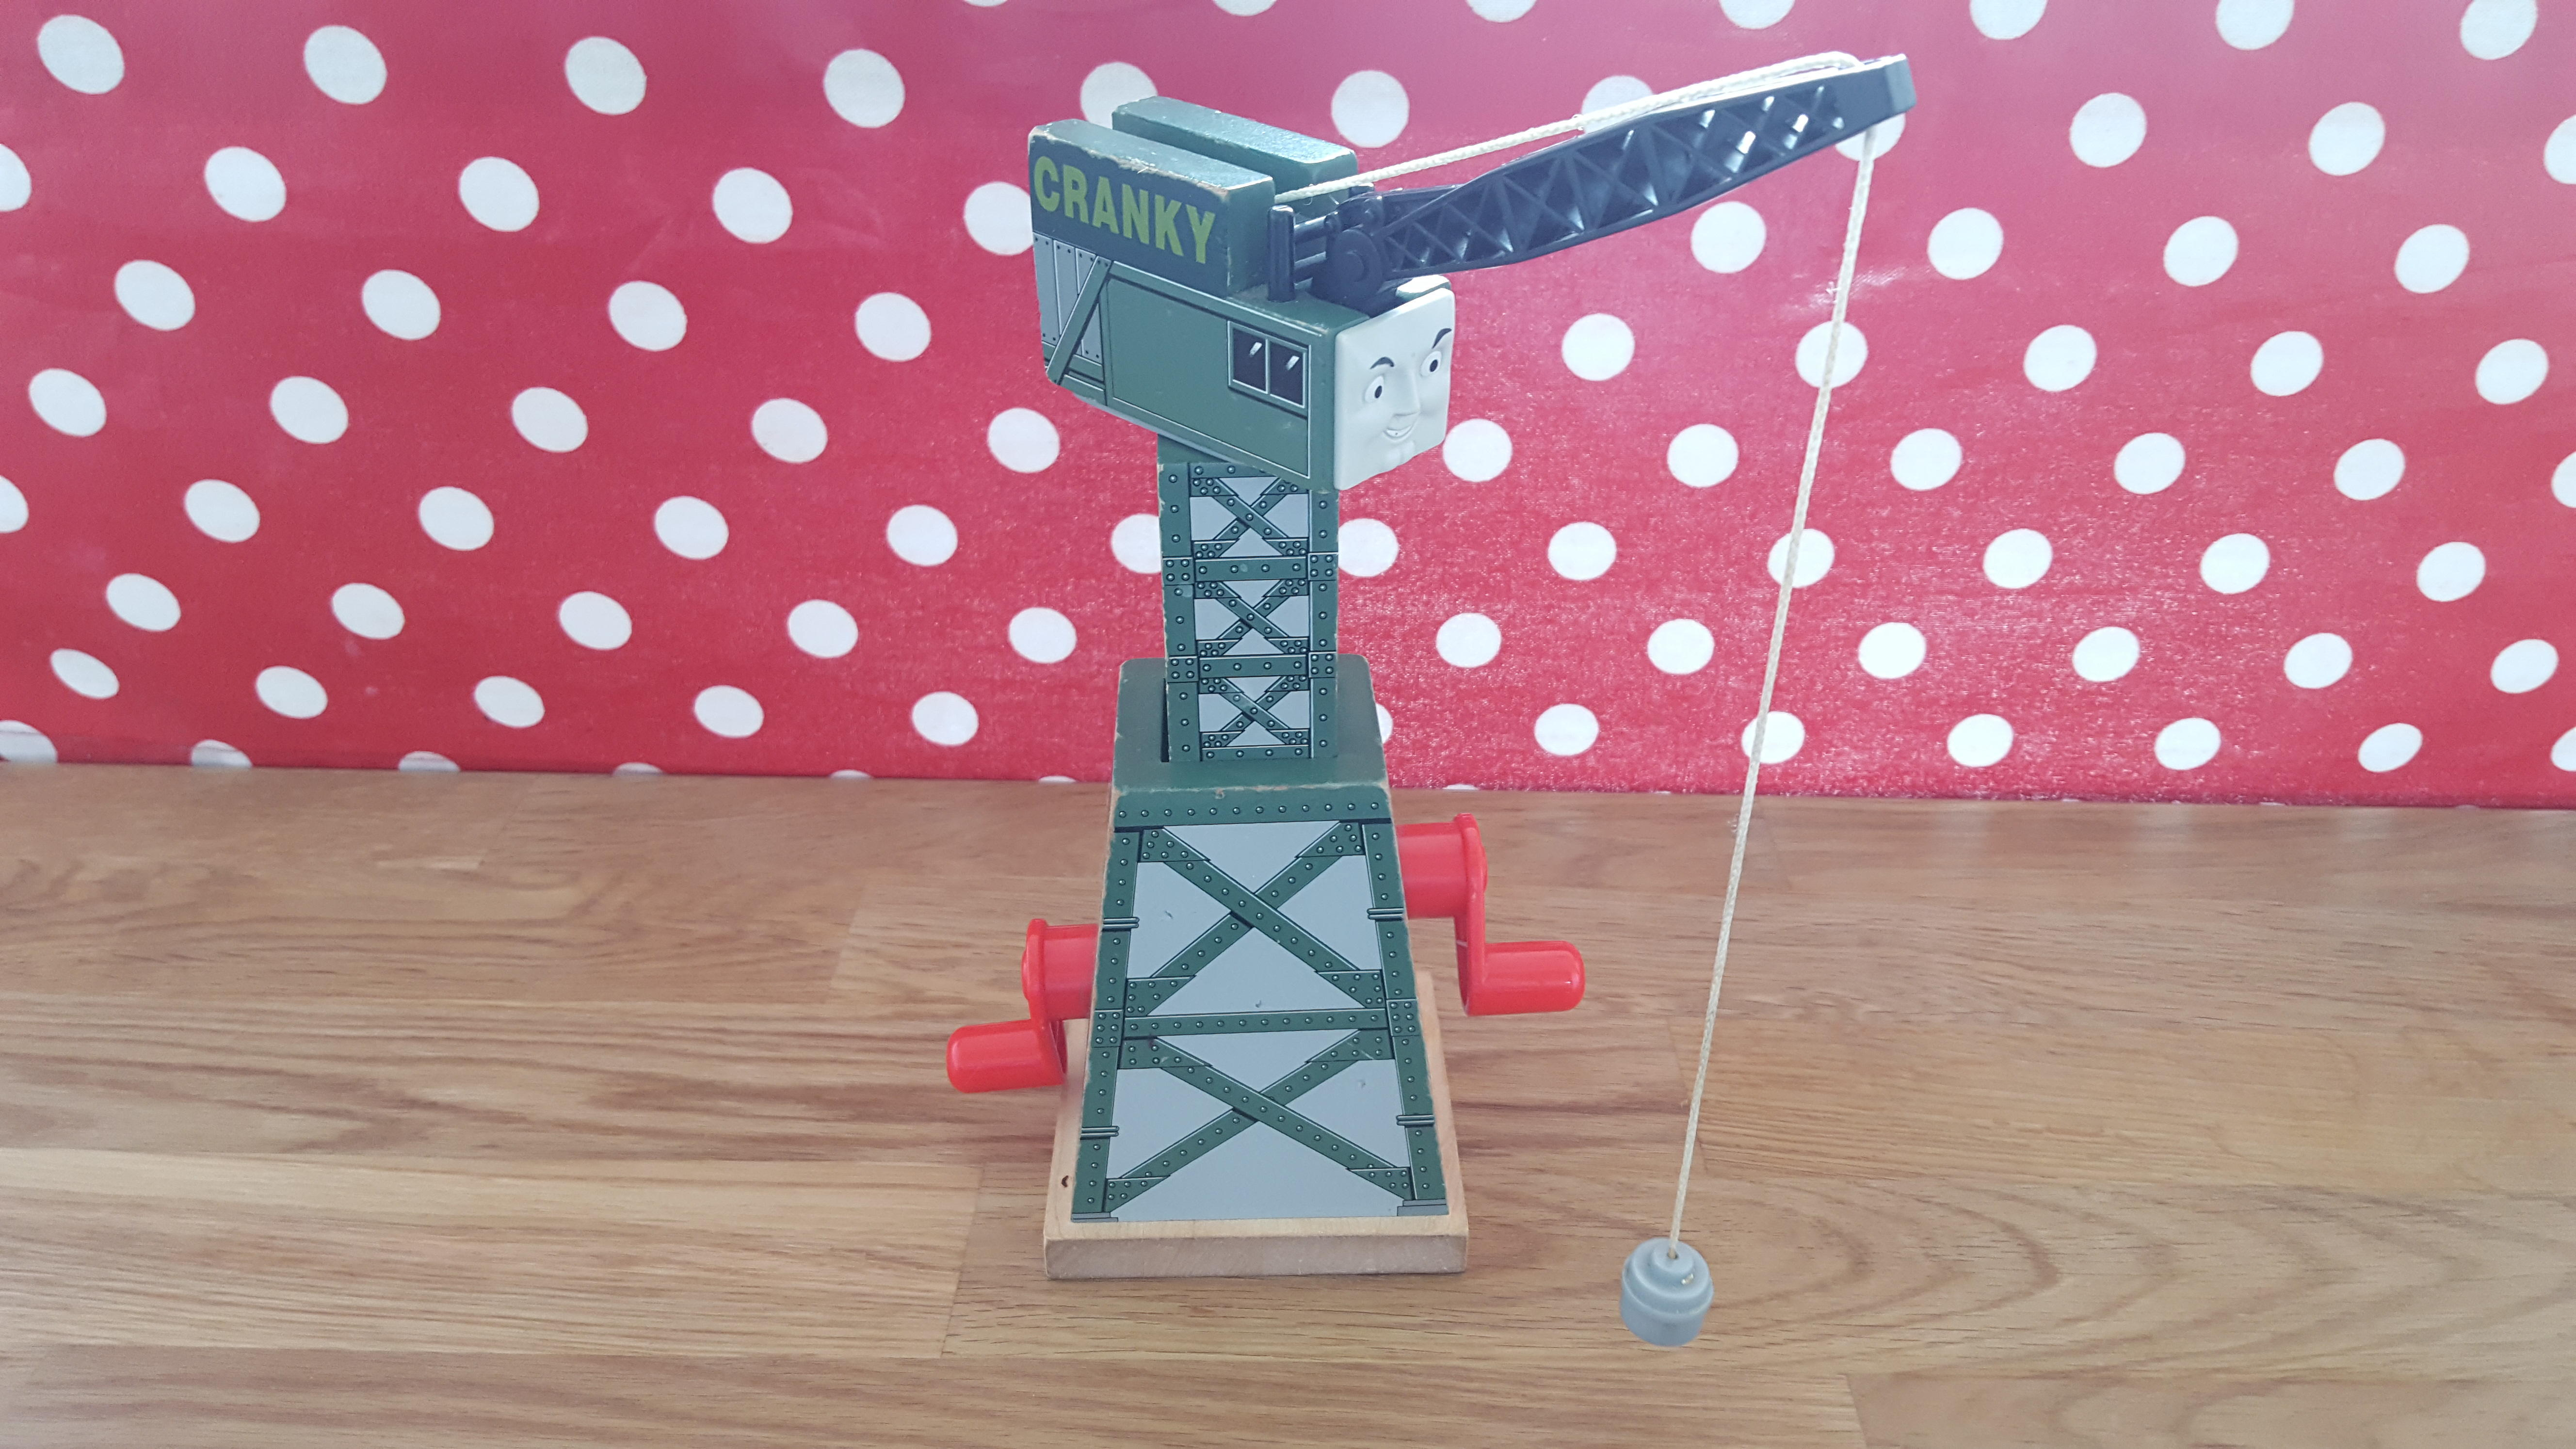 Thomas The Tank Engine Cranky Crane Wooden Toy For Brio Train Set